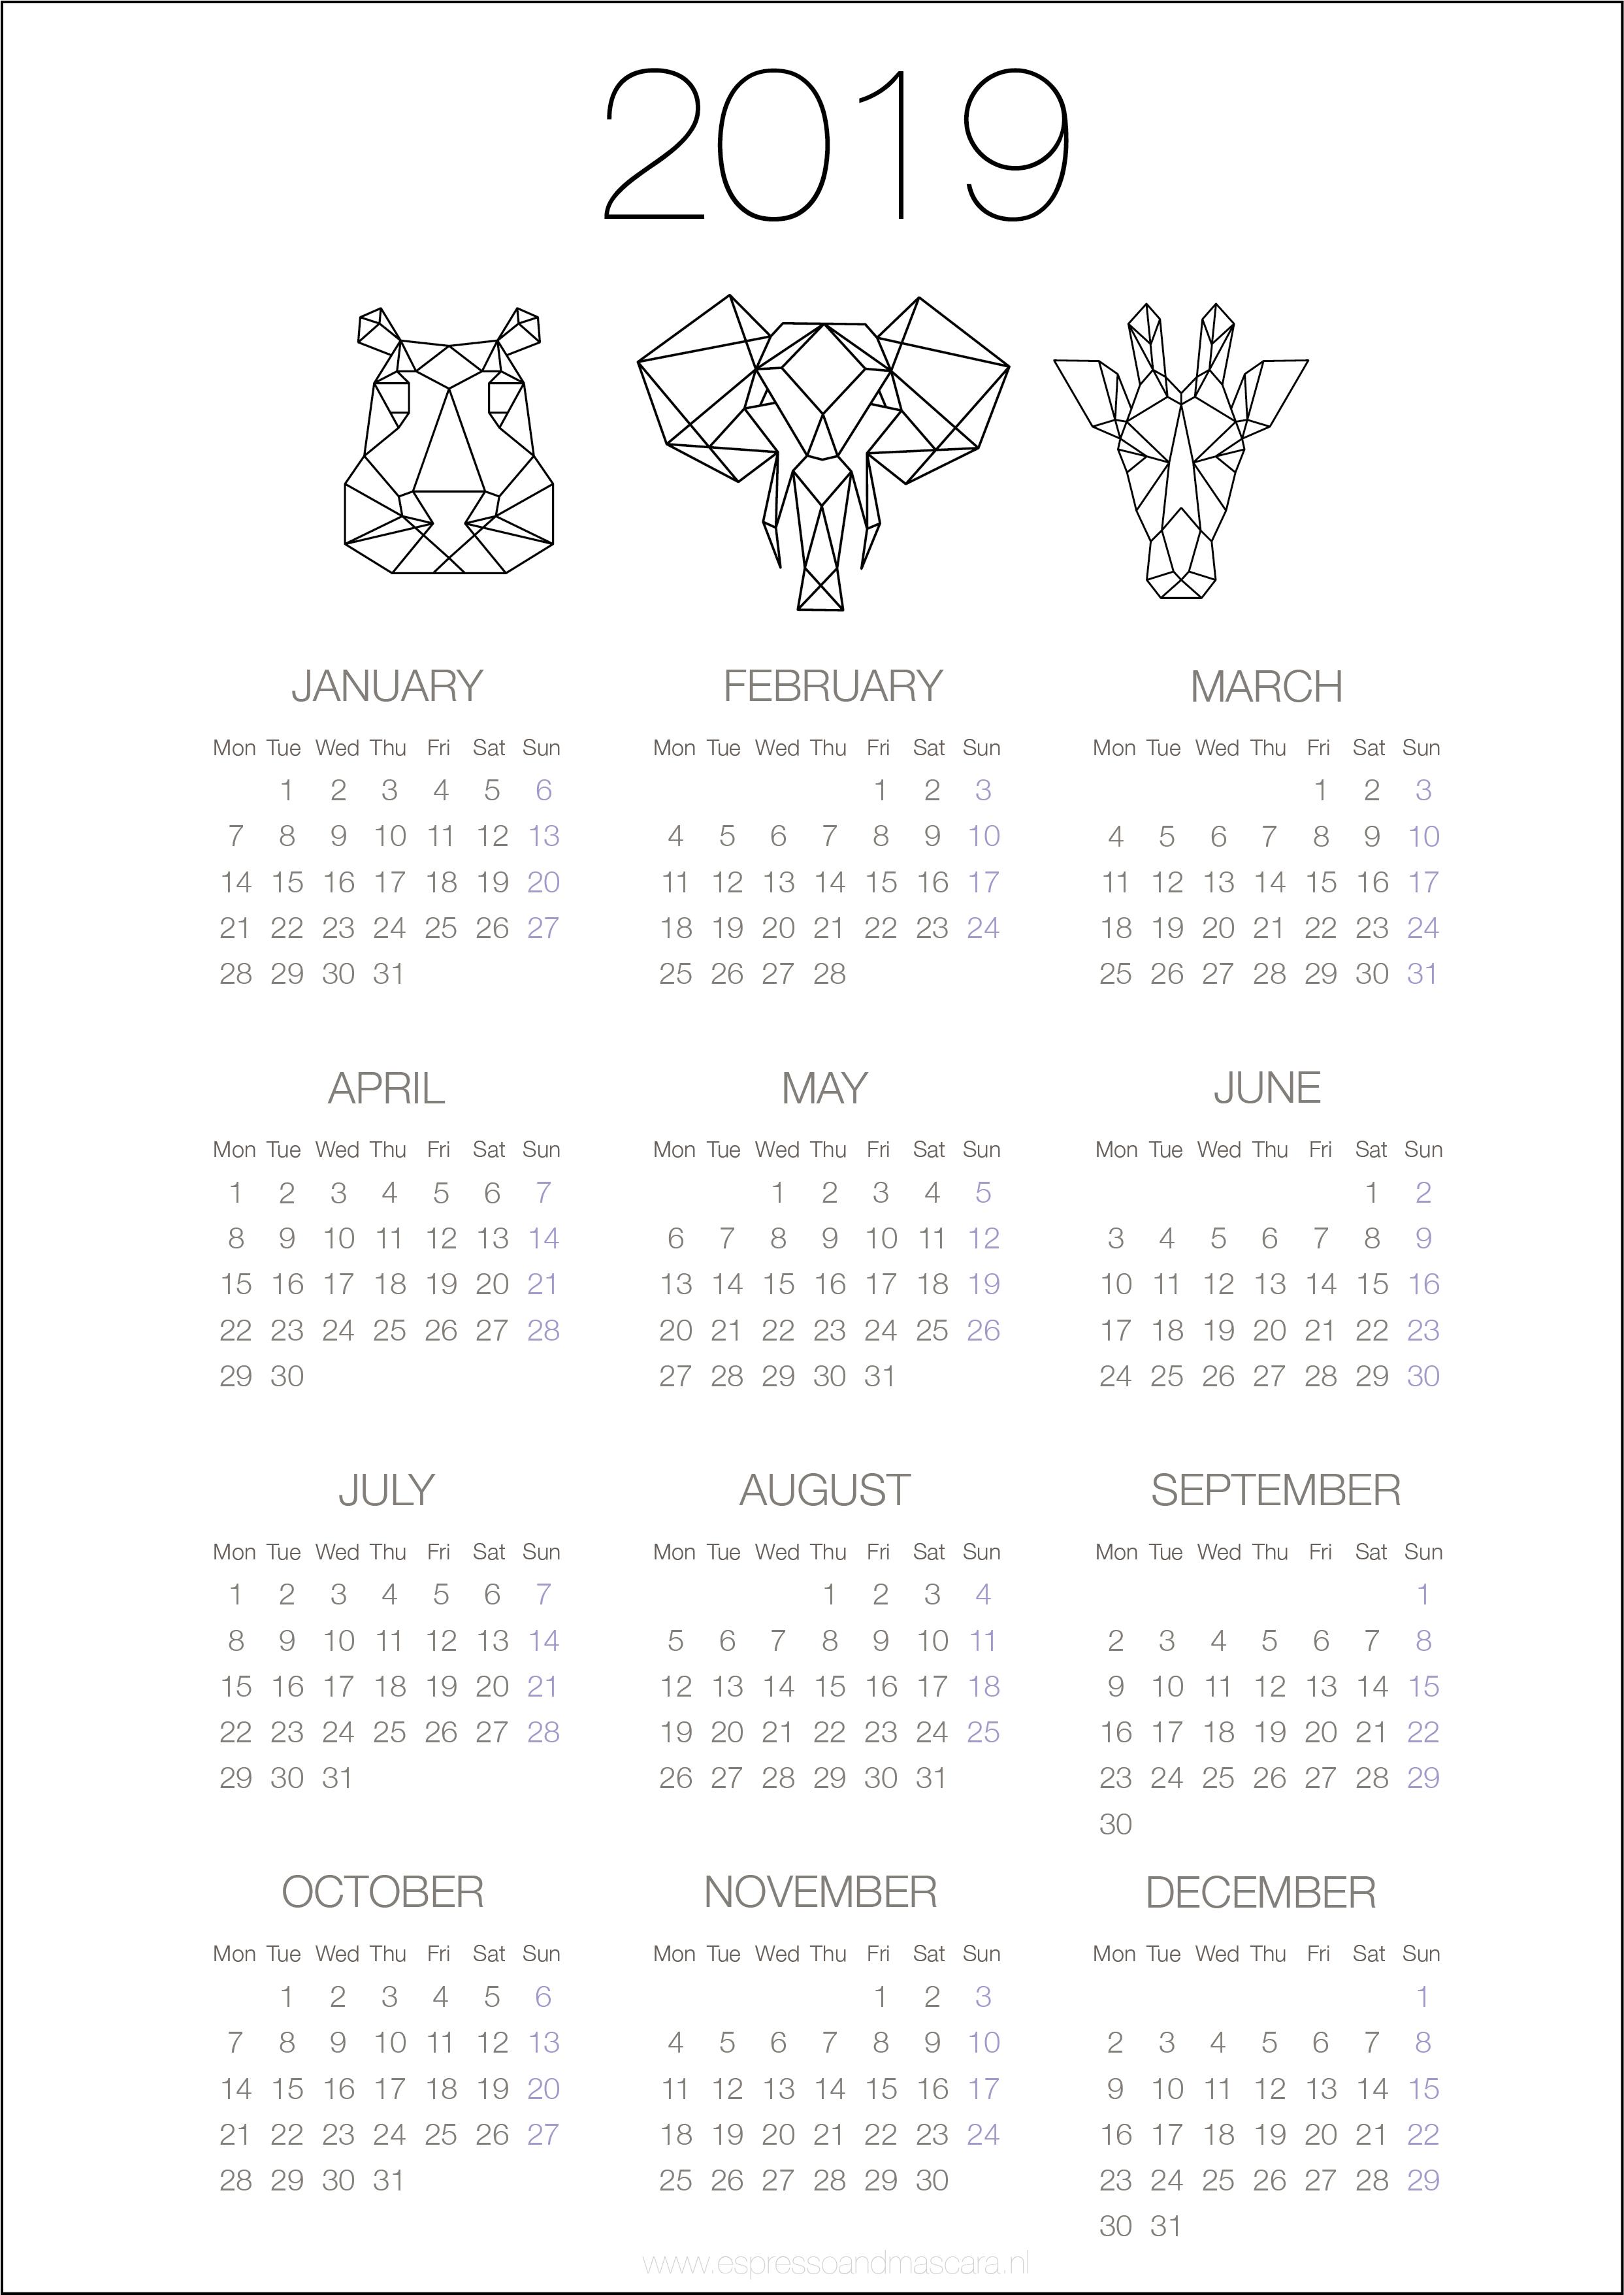 Calendars 2019 Free Download Kalendar Dlya Pechati Planirovshik Raspechatat Planirovshiki